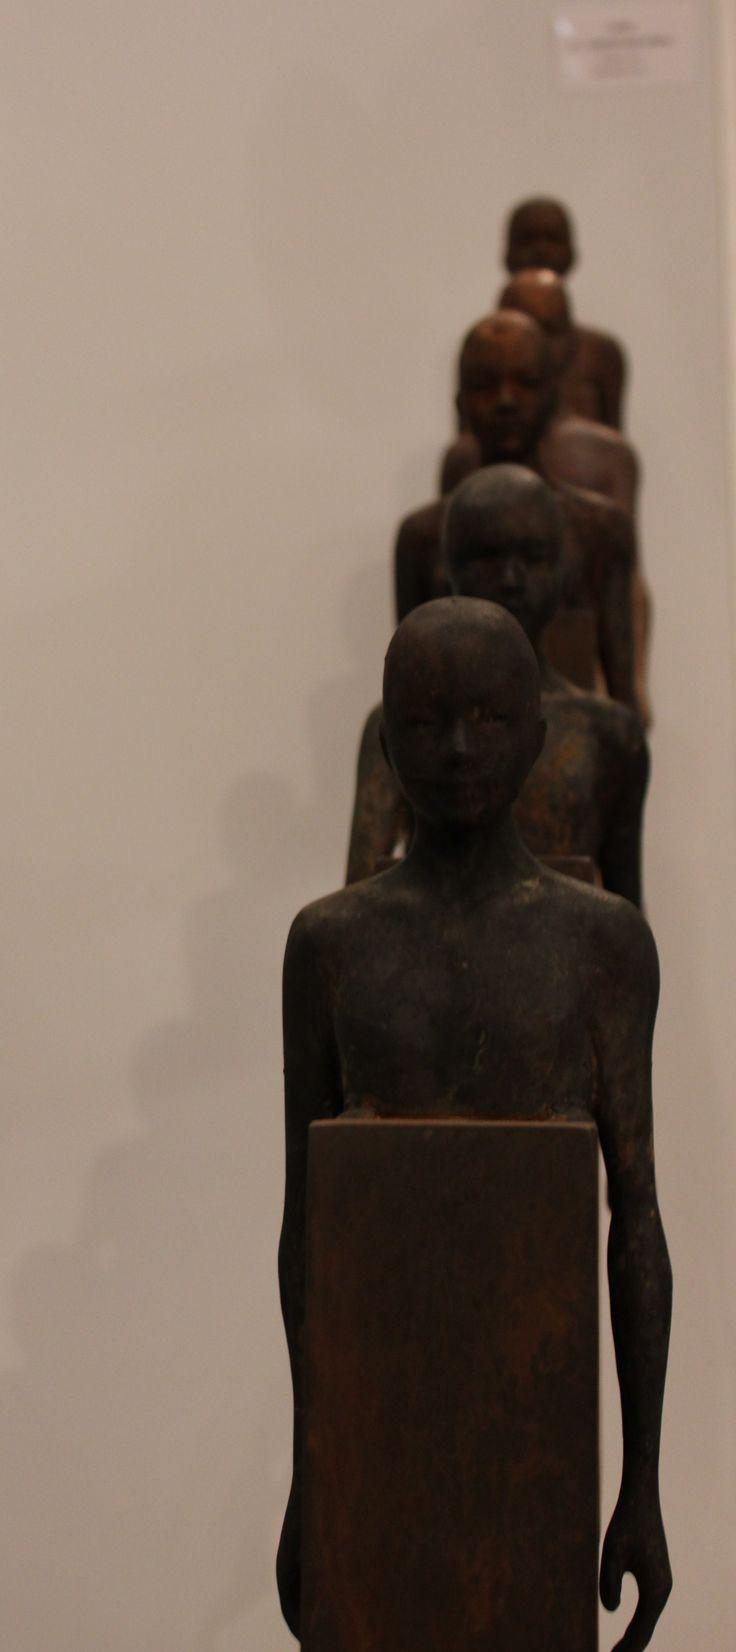 #contemporaryistanbul #art #sanat #exhibition #sergi #resim #heykel #lutfikirdar #contemporaryart #istanbul #turkey